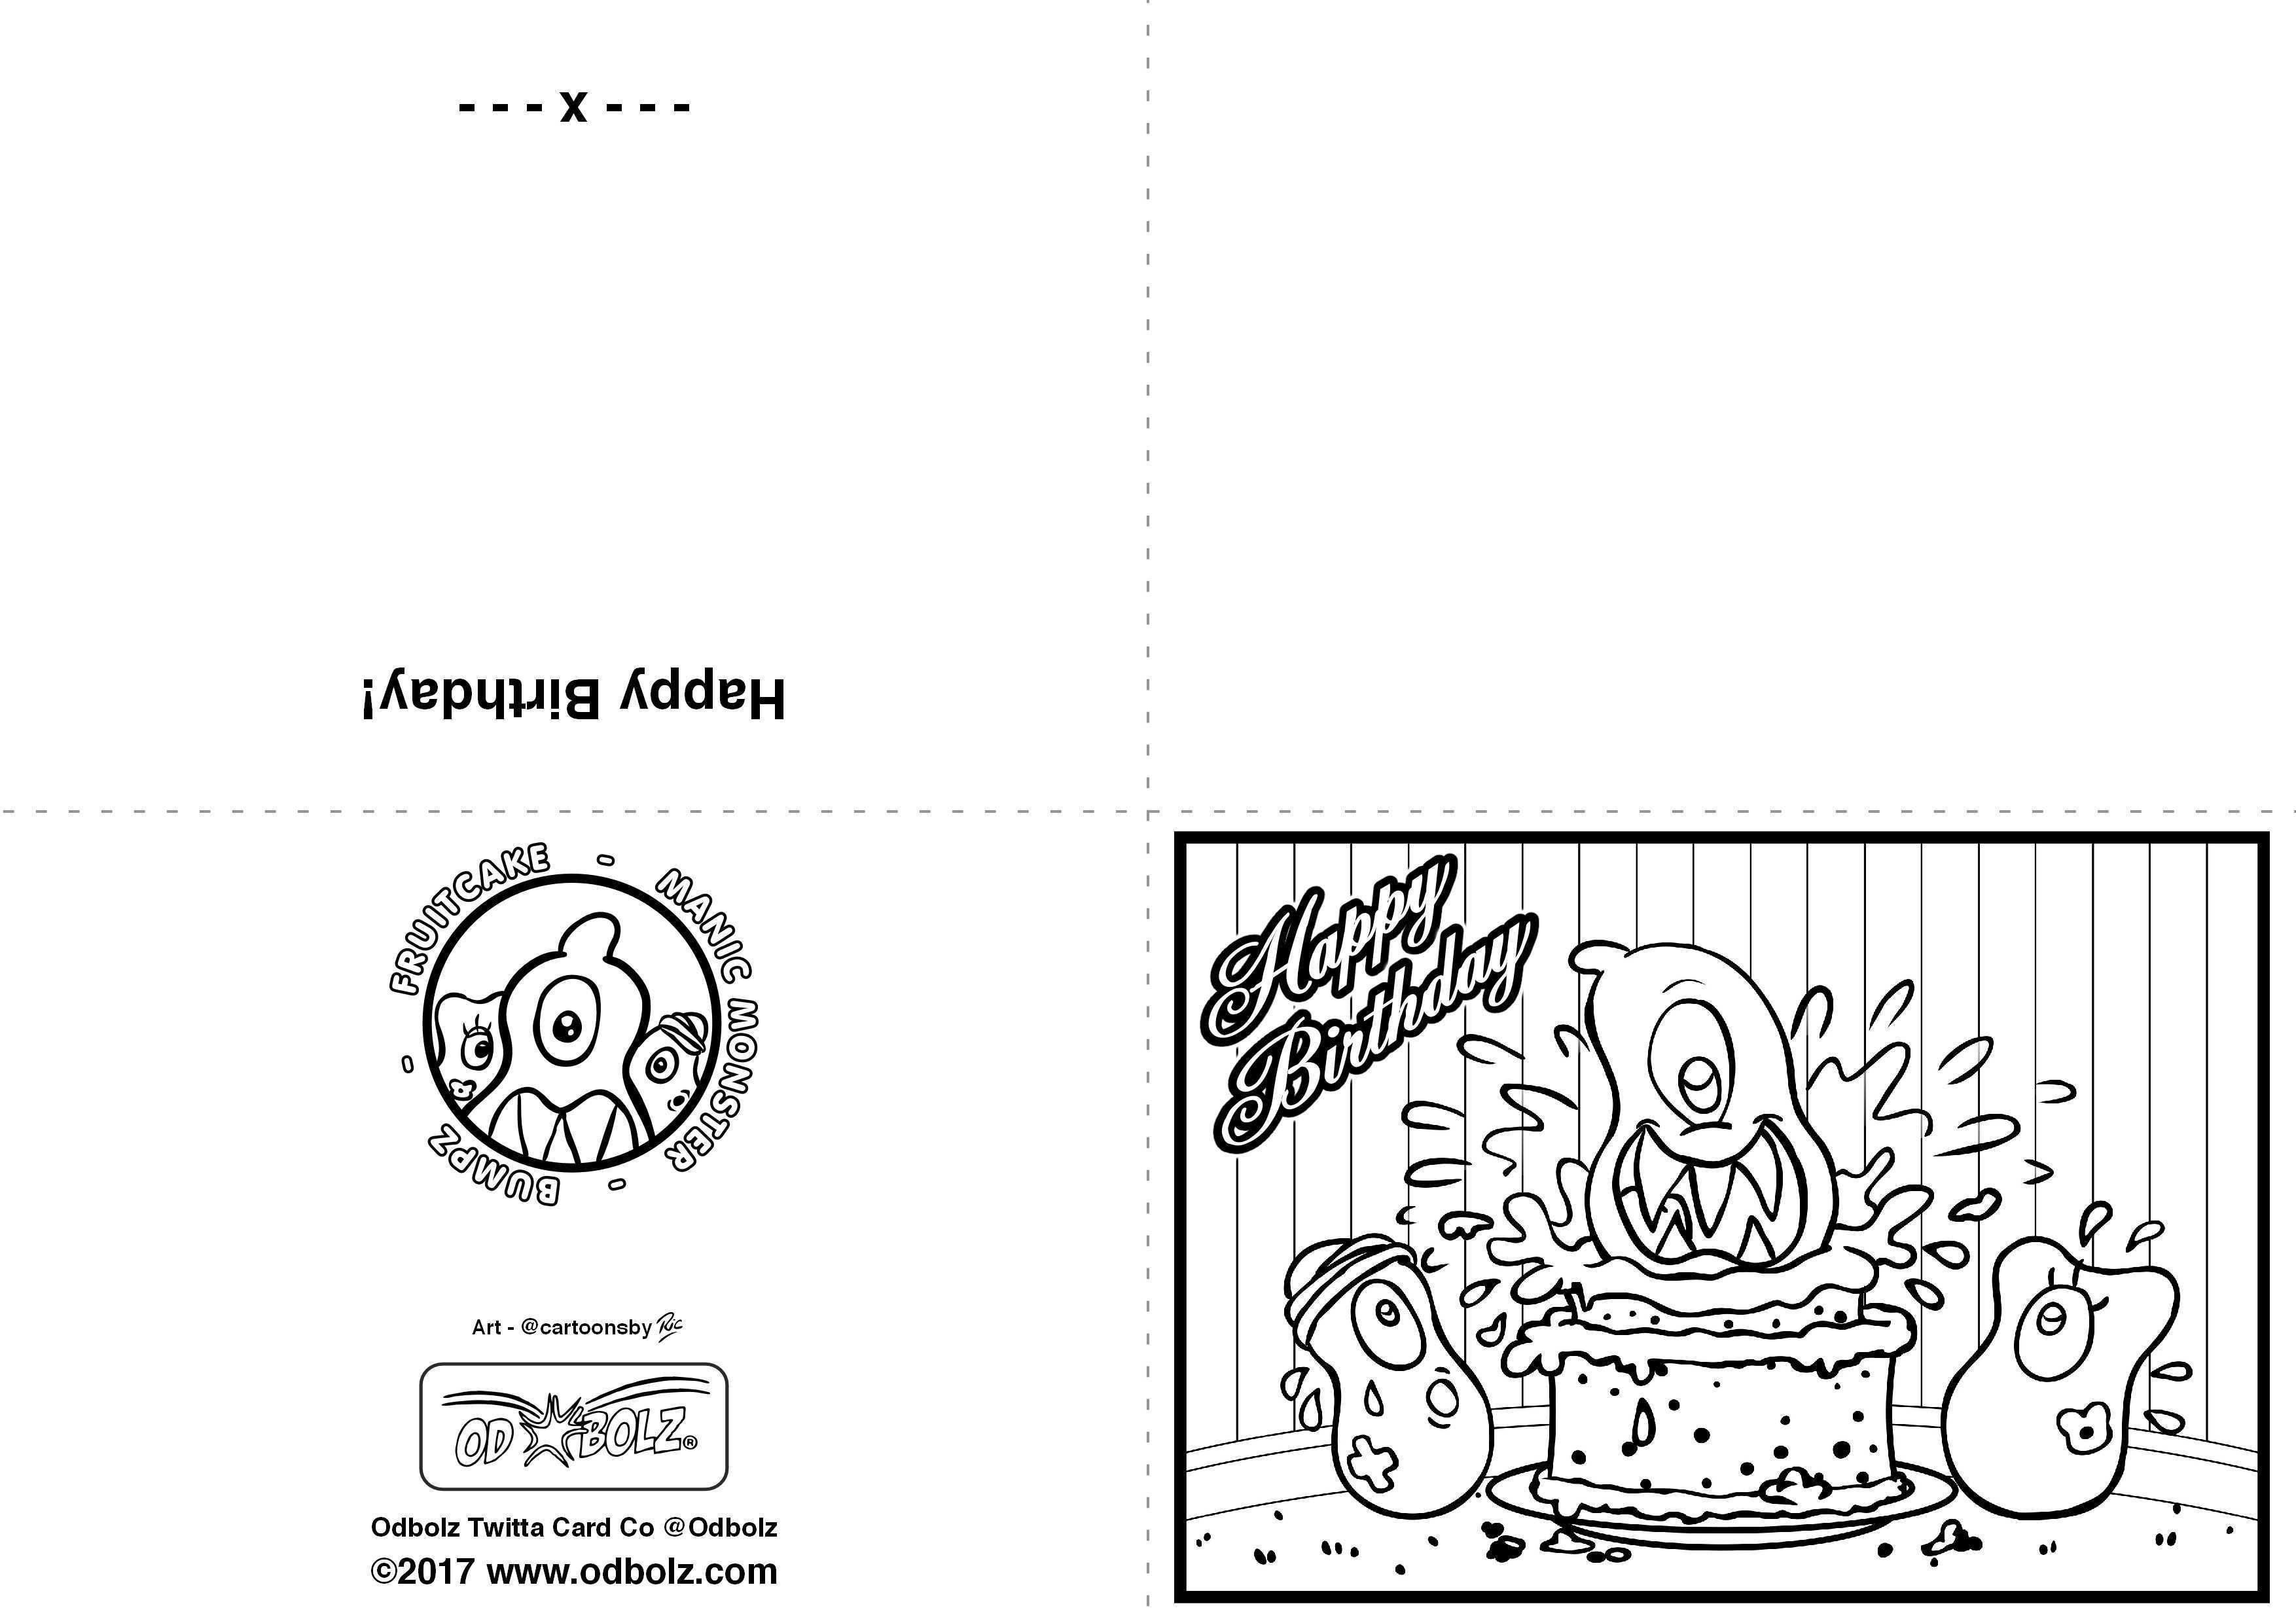 Free Printable Gift Certificates Awesome Free Printable Money Cards - Free Printable Money Cards For Birthdays